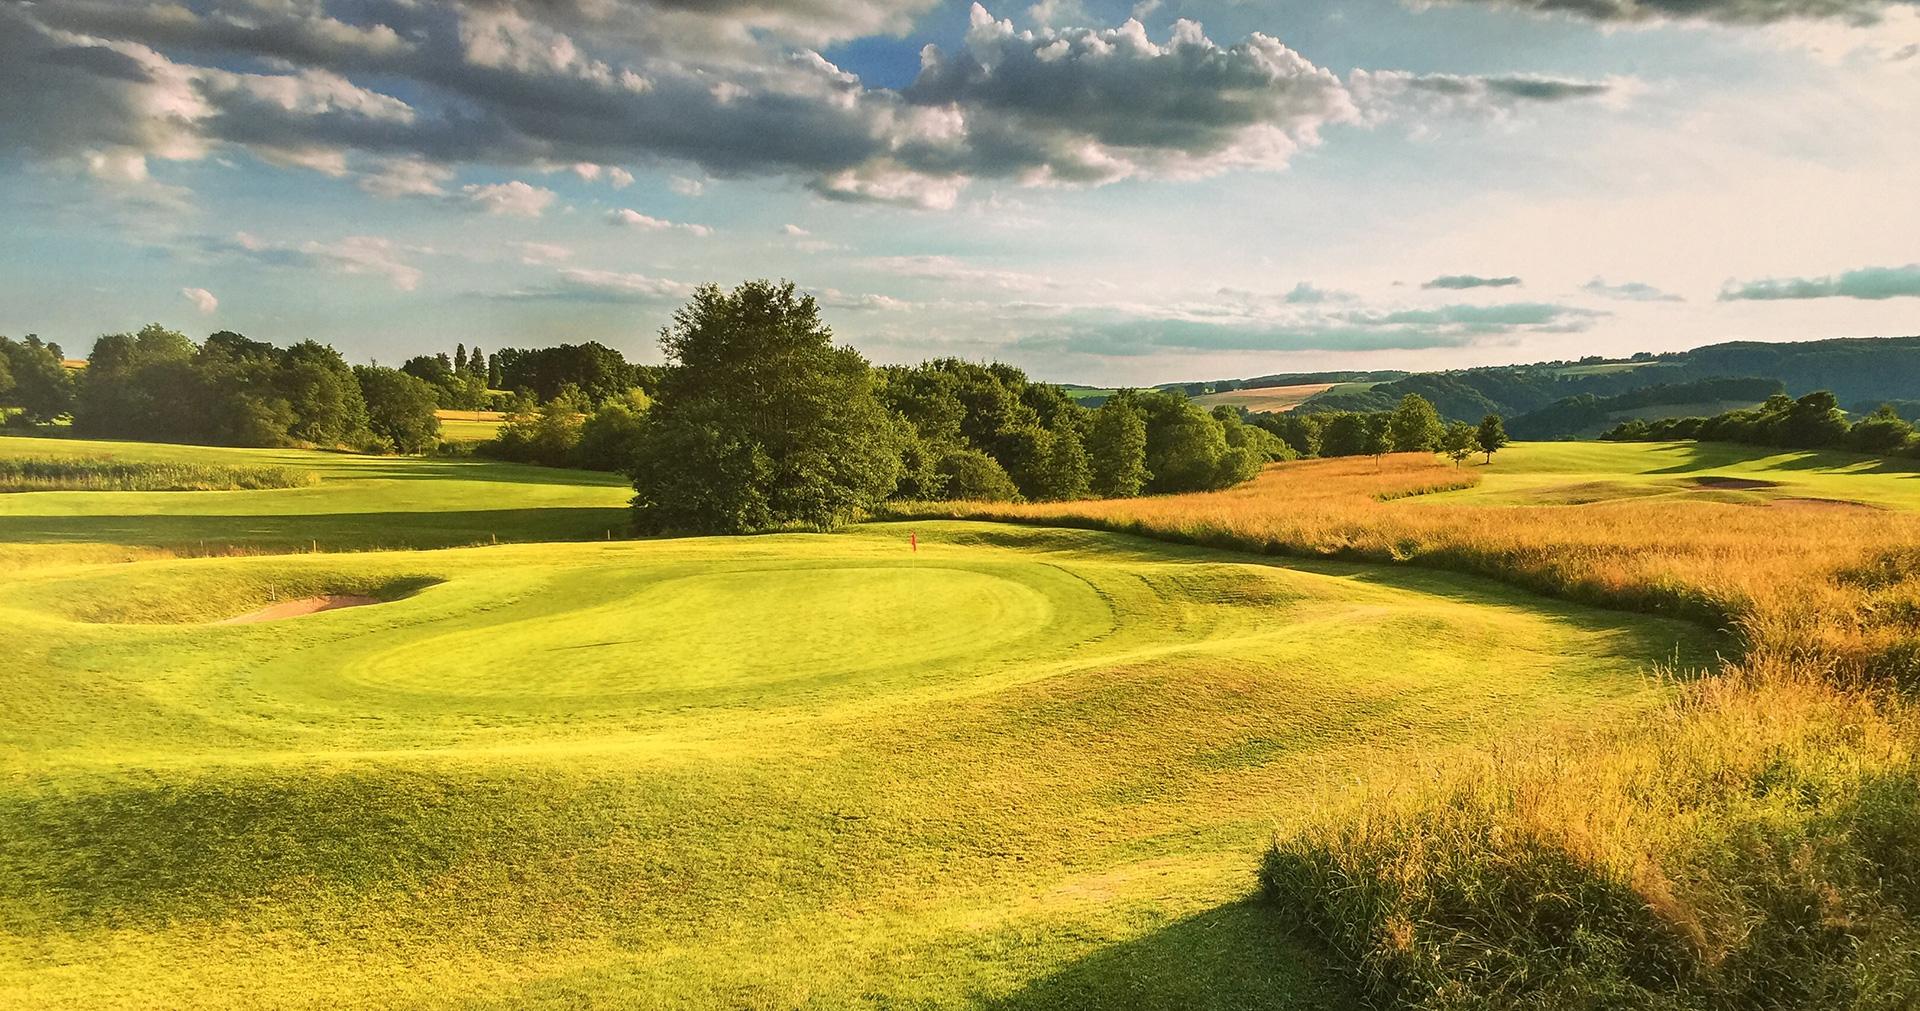 ironman 2019 golf resort bitburger land. Black Bedroom Furniture Sets. Home Design Ideas